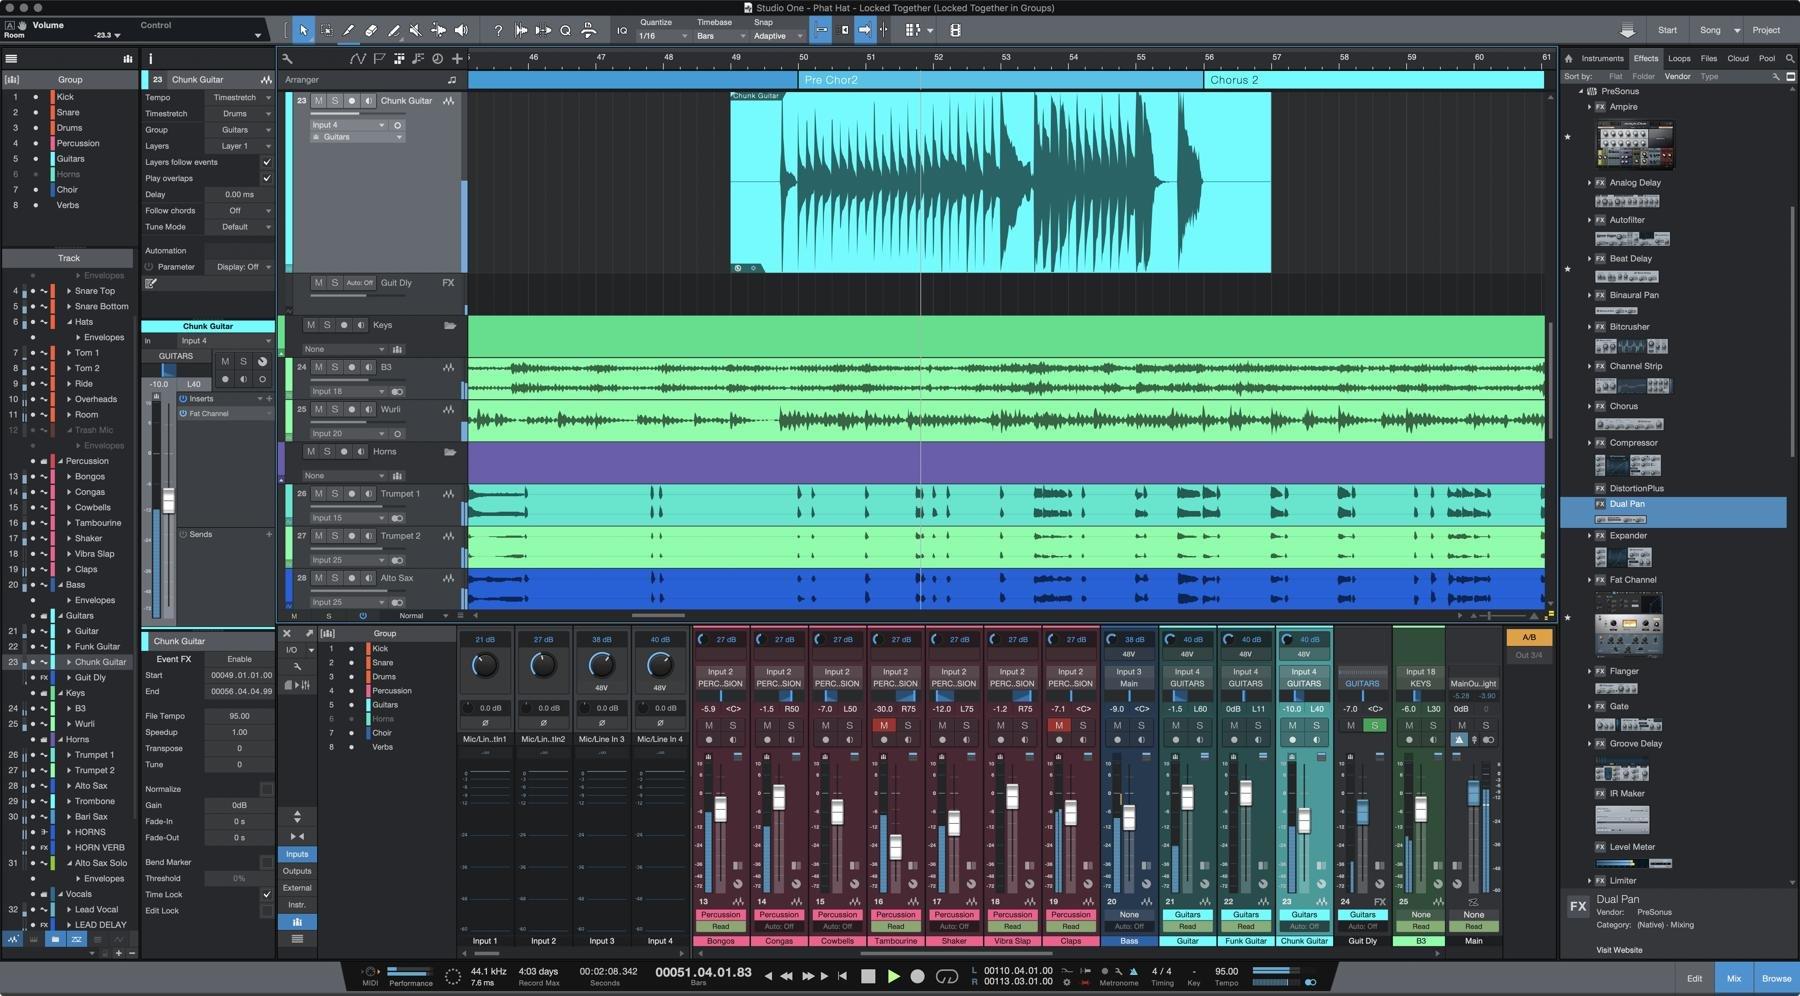 PreSonus Studio One 4 5 Professional Upgrade from